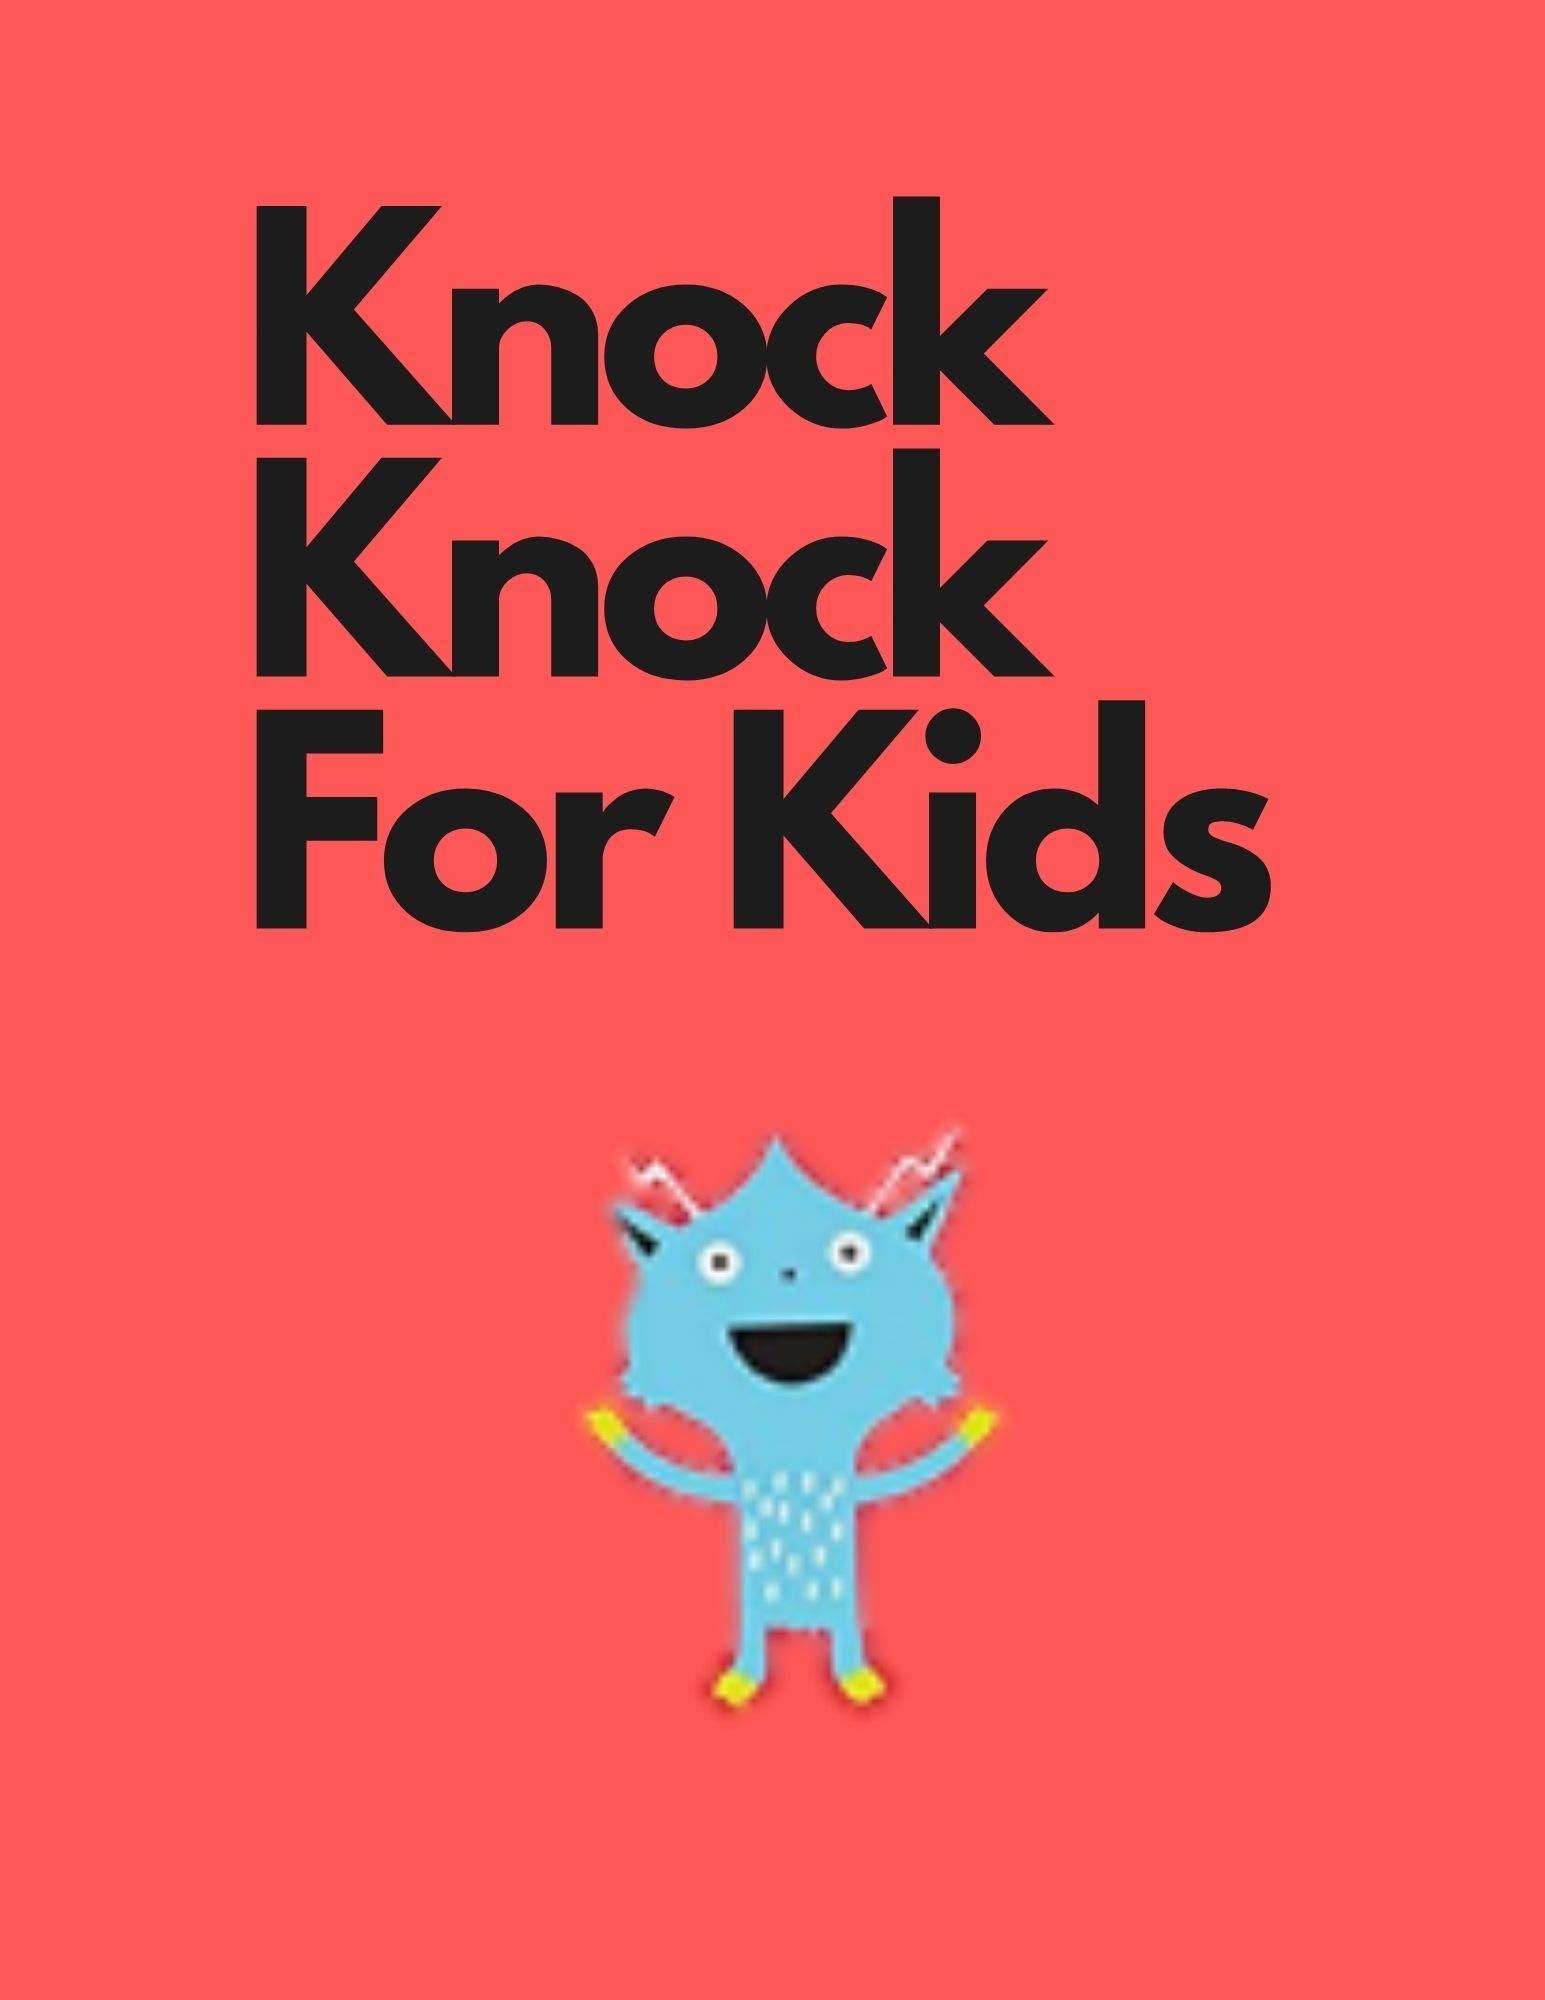 Knock Knock Jokes For Kids: kids knock knock joke books ages 4-8.joke books for kids age 10 - 12.silly sally.joke books for kids 8-10.joke books for kids 5-7.joke book Knock Knock Jokes For Kids